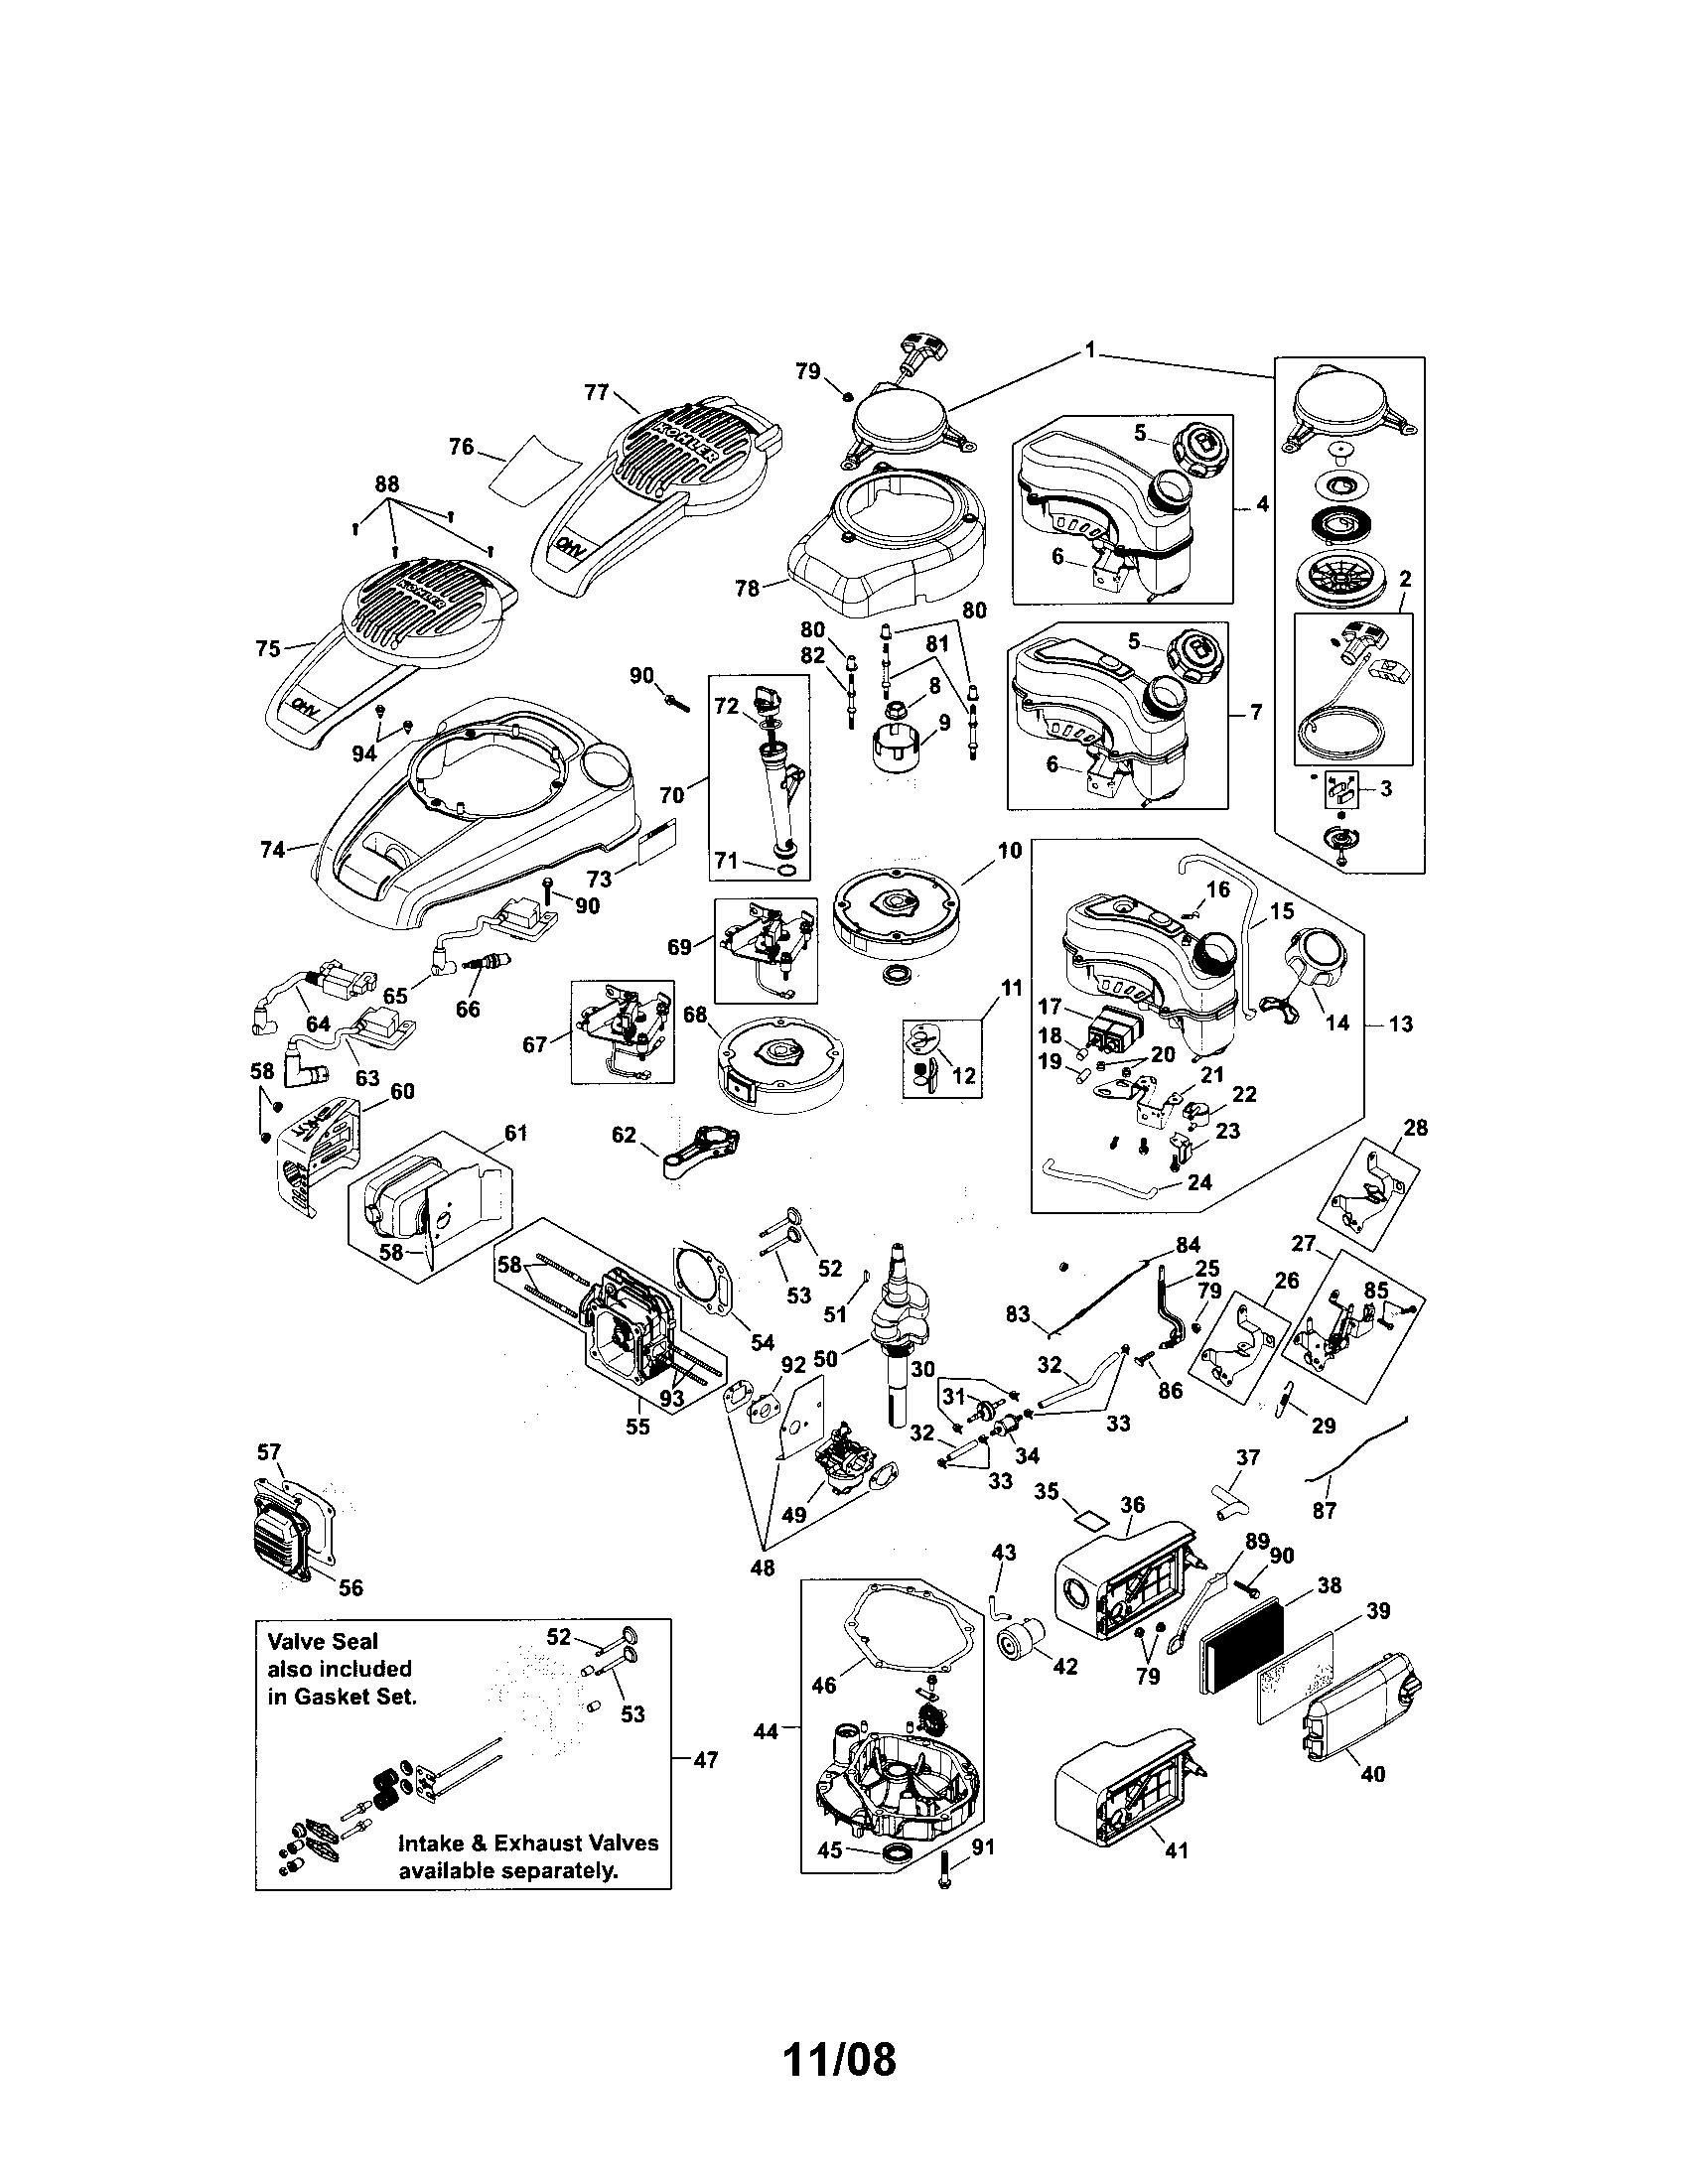 Kohler engine diagram kohler engine diagram diagram chart gallery of kohler engine diagram 16 hp kohler